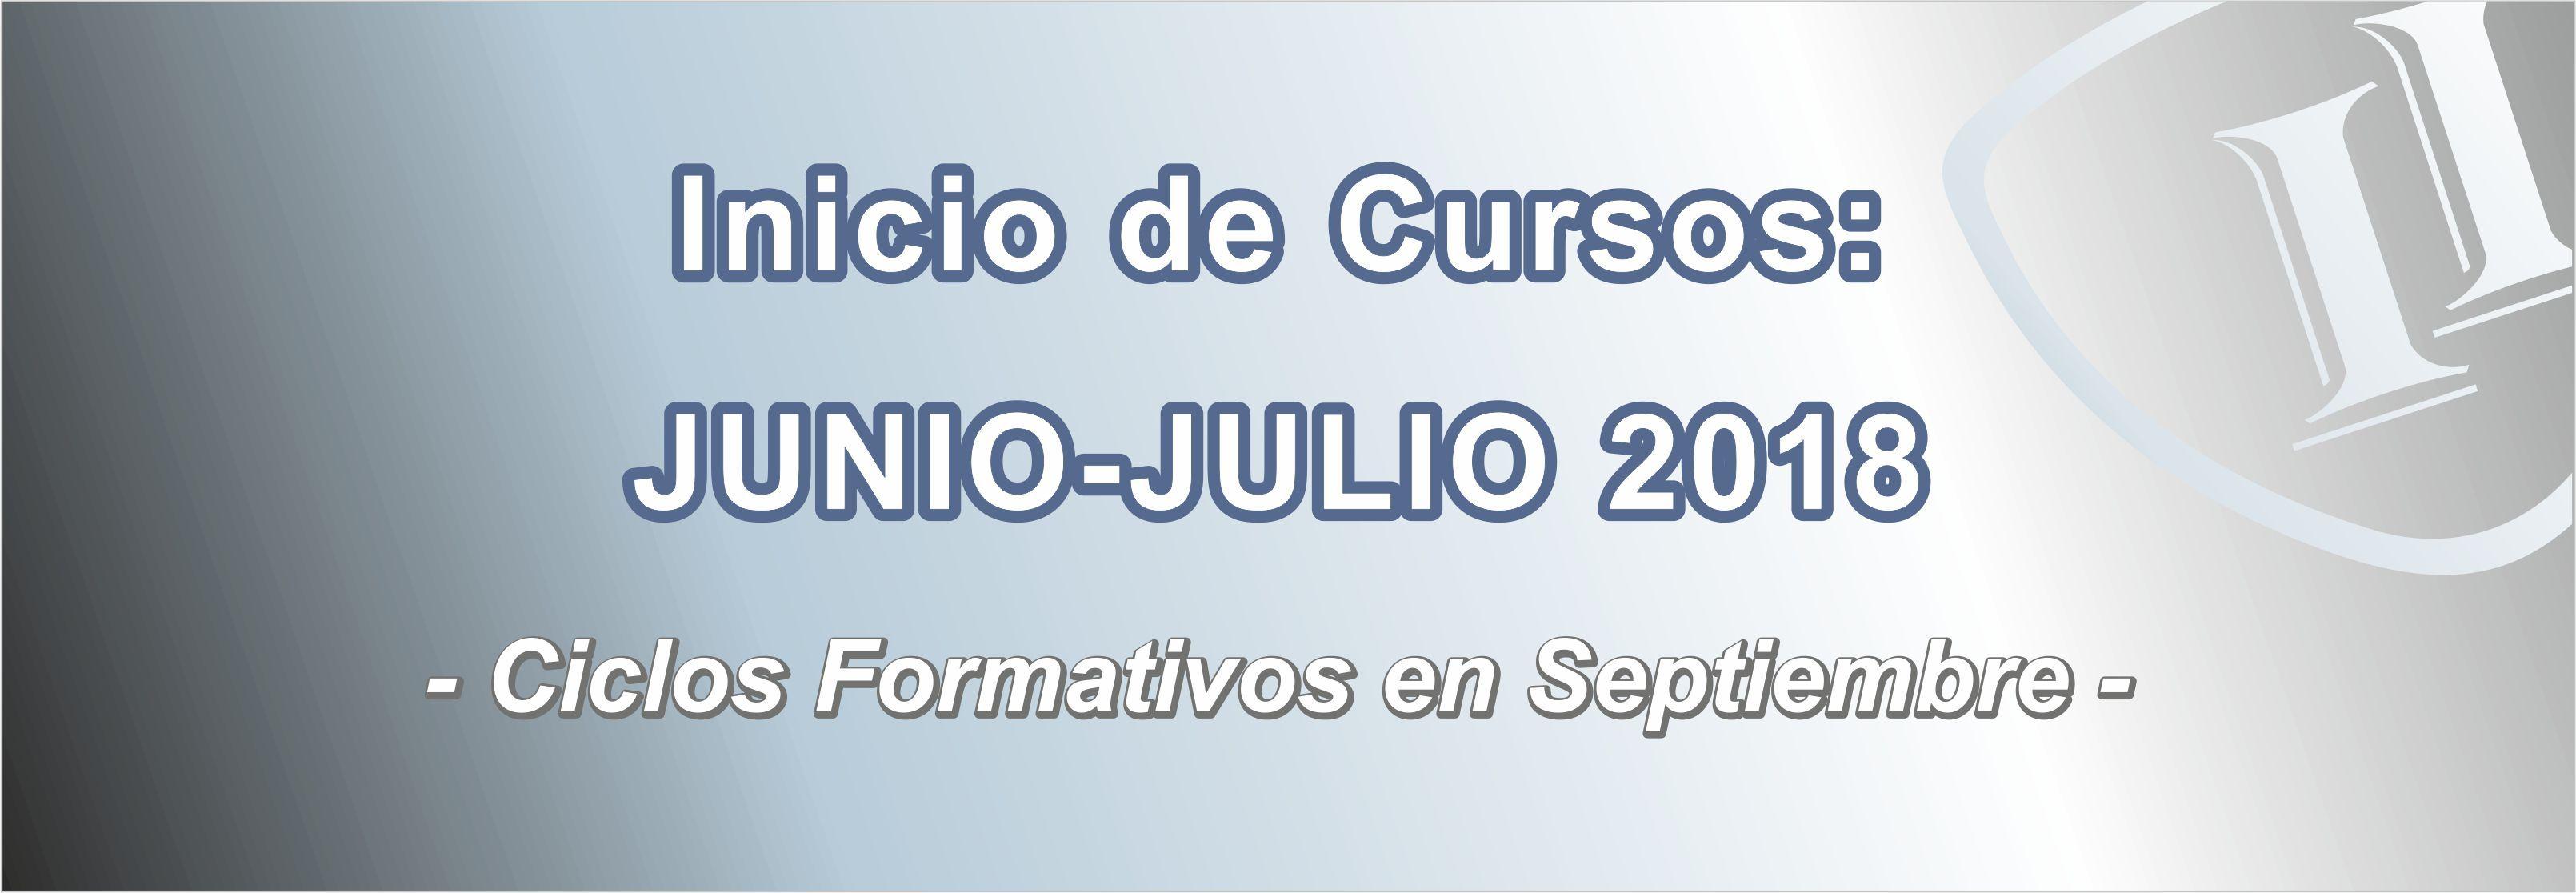 baner-inicio-cursos-Jun_Jul-18-compressor